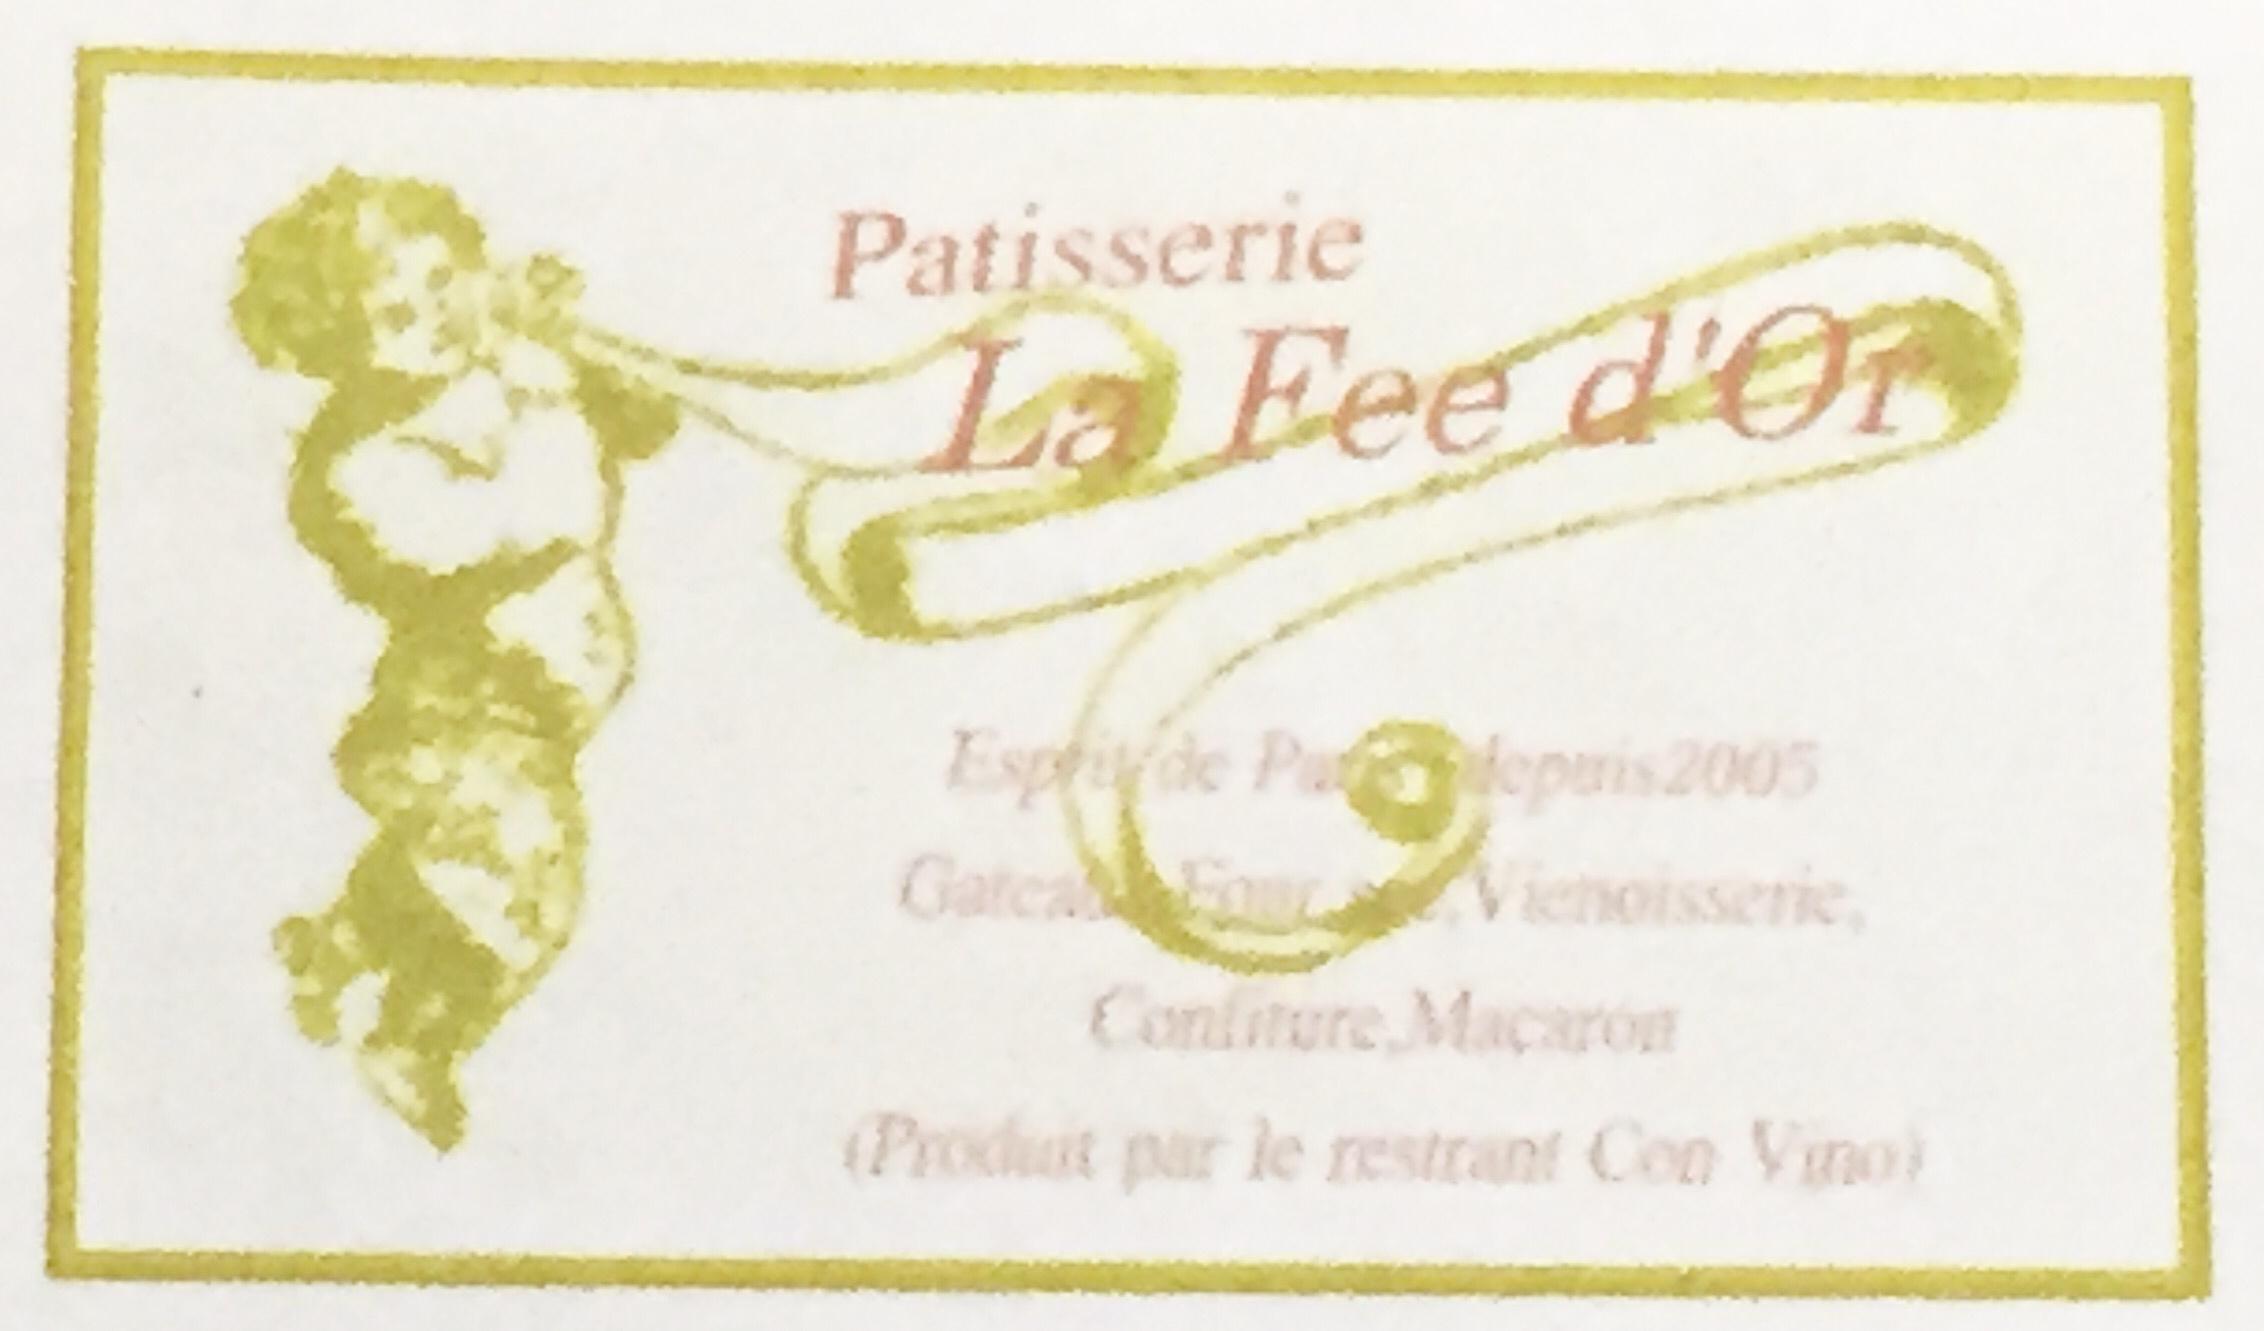 Pâtisserie La Fée d'or 〜パティスリー ラフェドール